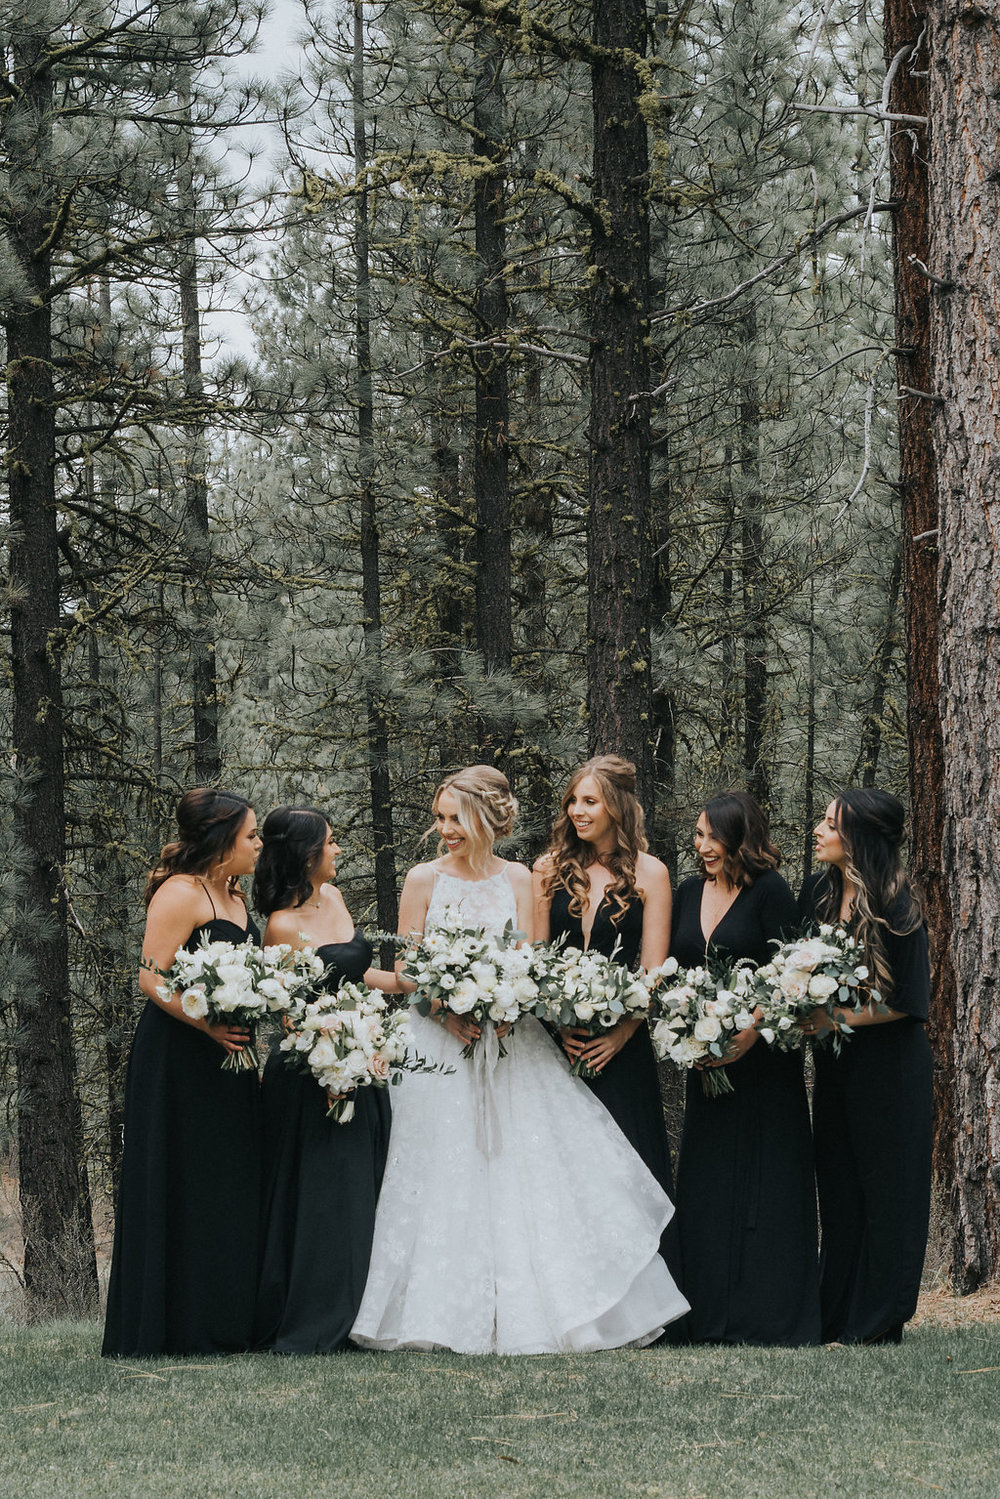 Glitter Floral Print Wedding Dress with Black Bridesmaid Dresses